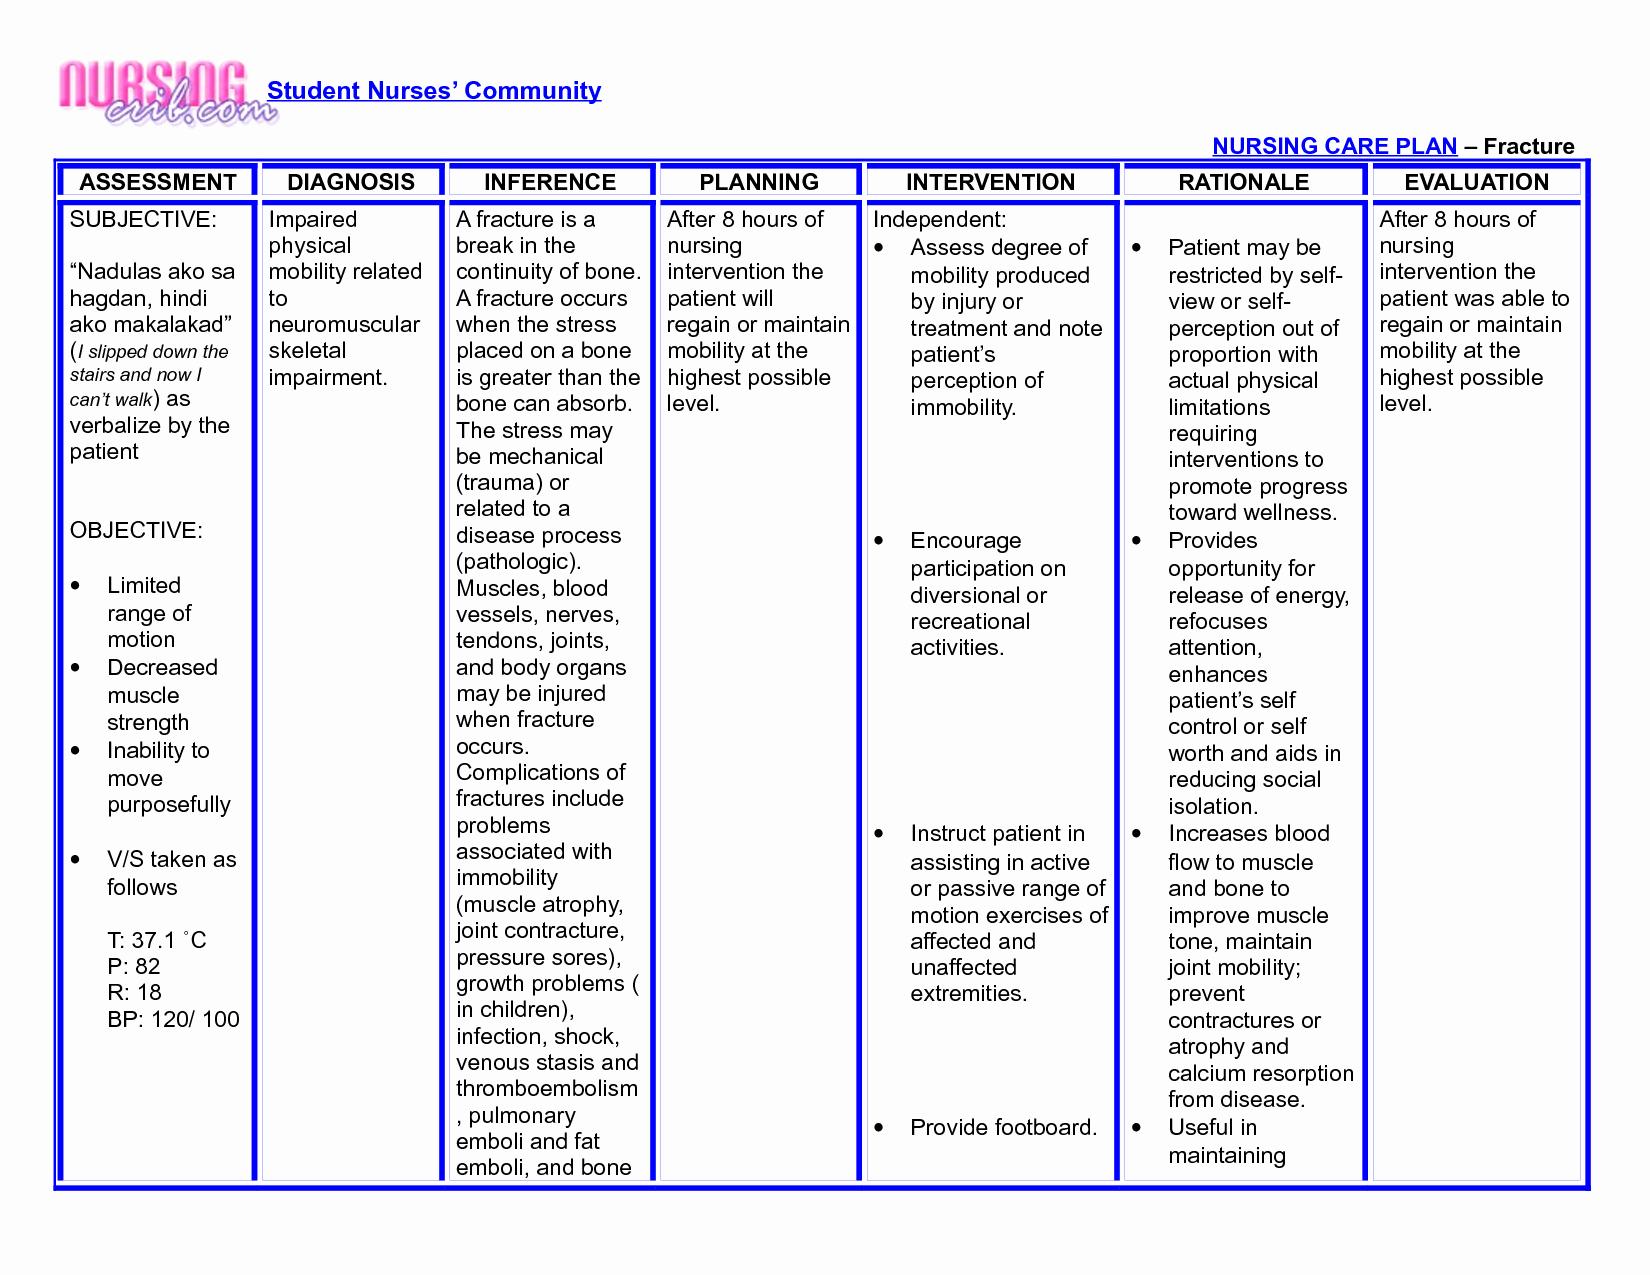 Examples Of Nursing Care Plans for Constipation Inspirational Nanda Nursing Diagnosis for Infection Pfgm Medicinebtg